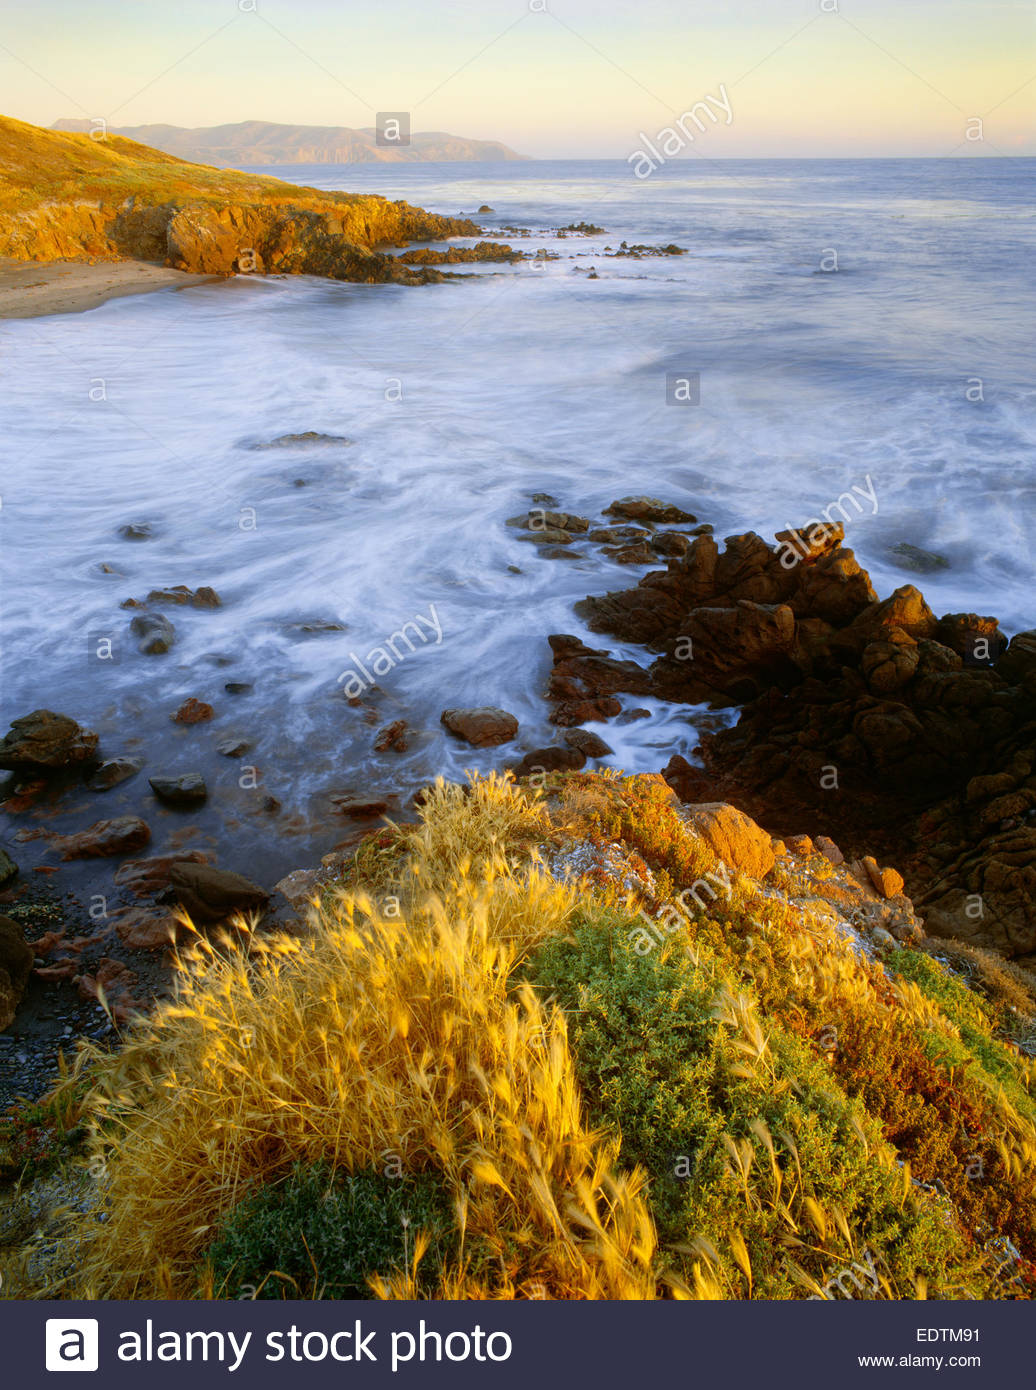 The west end of Santa Cruz Island Preserve The Nature Conservancy.  Santa Cruz Island, California. - Stock Image